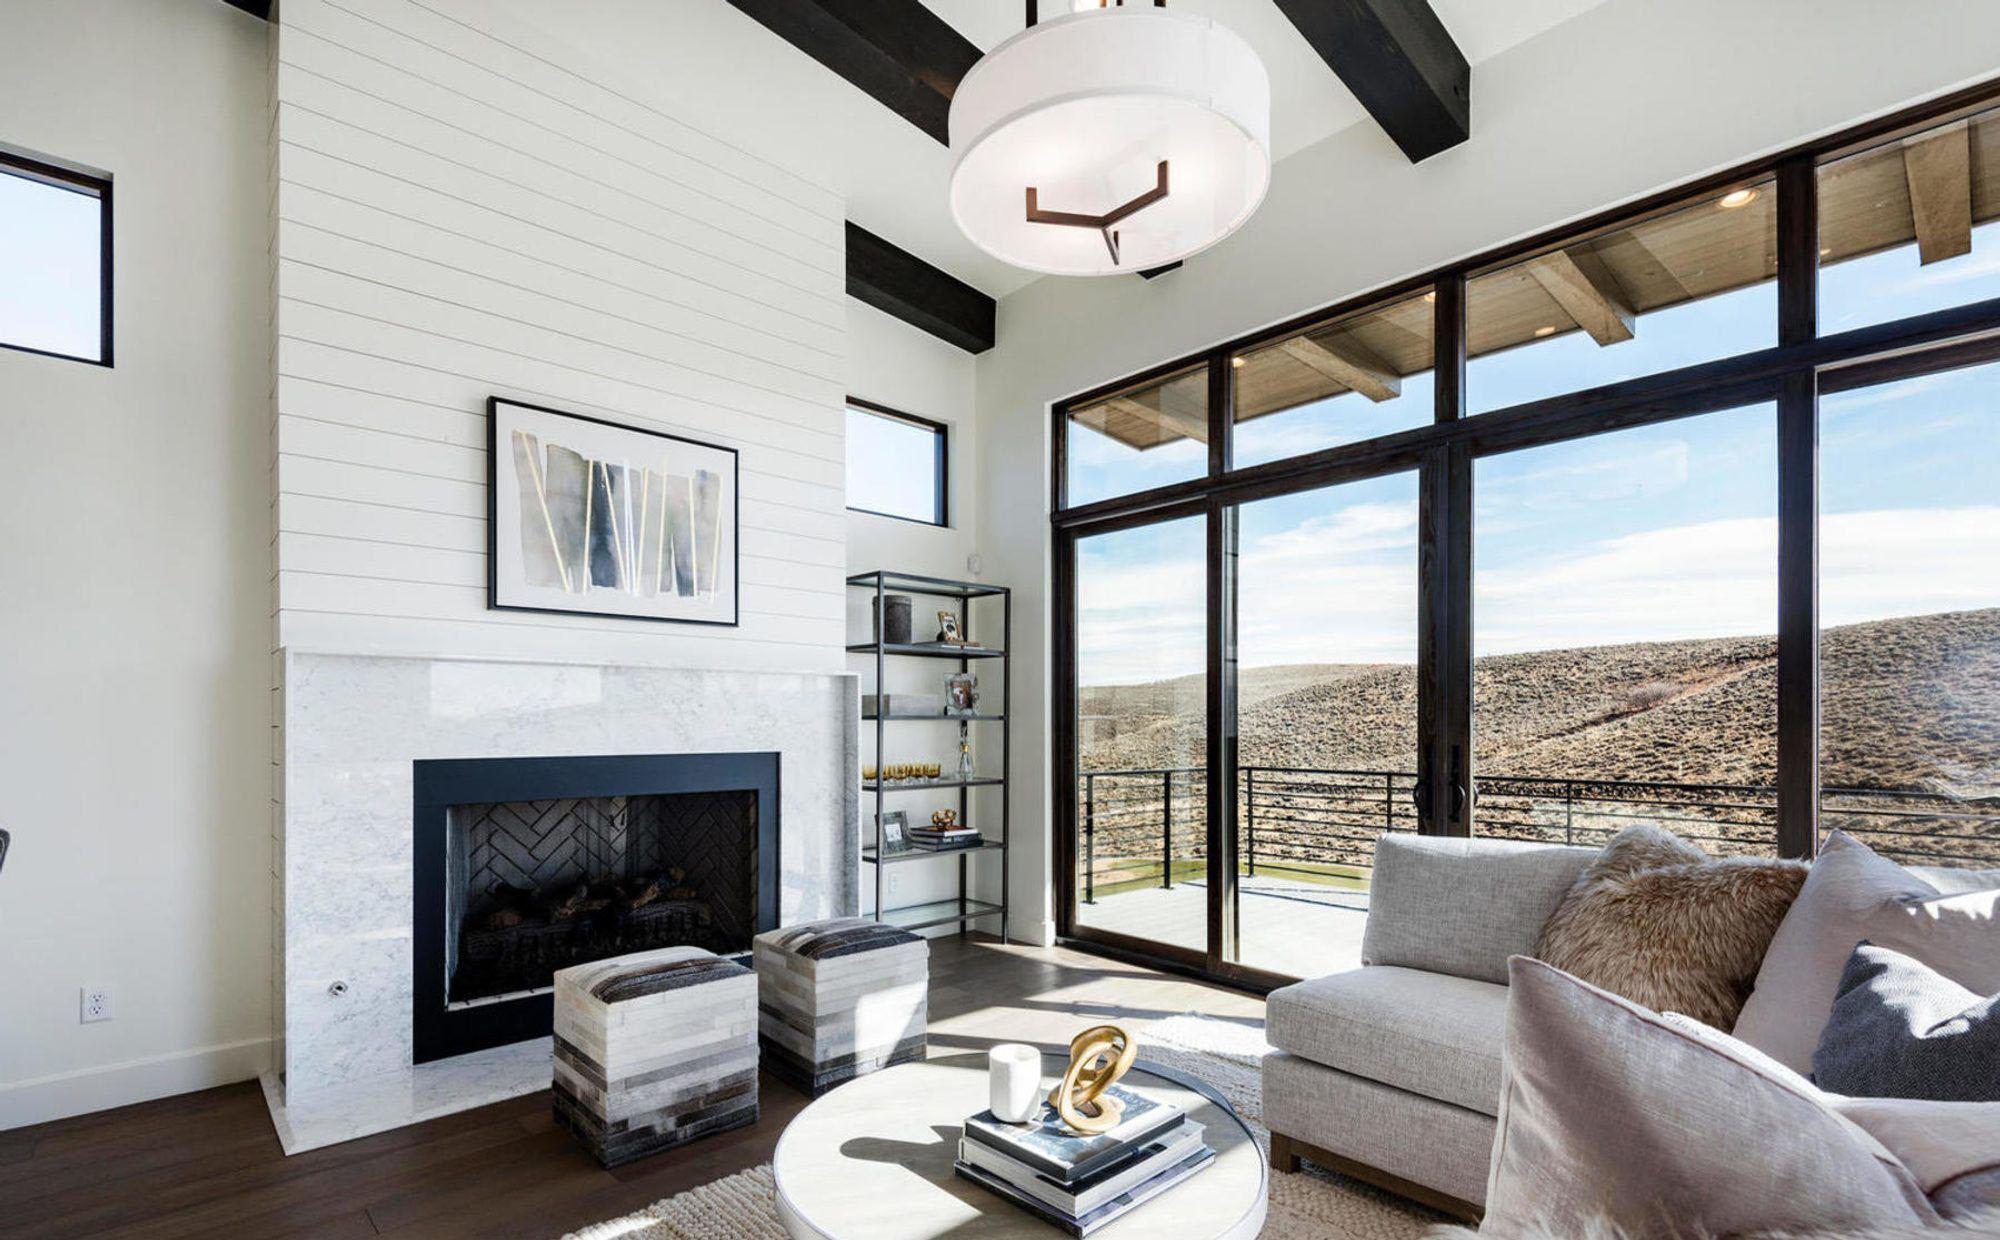 Modern home with thick sisal woven rug and a light grey sofa.